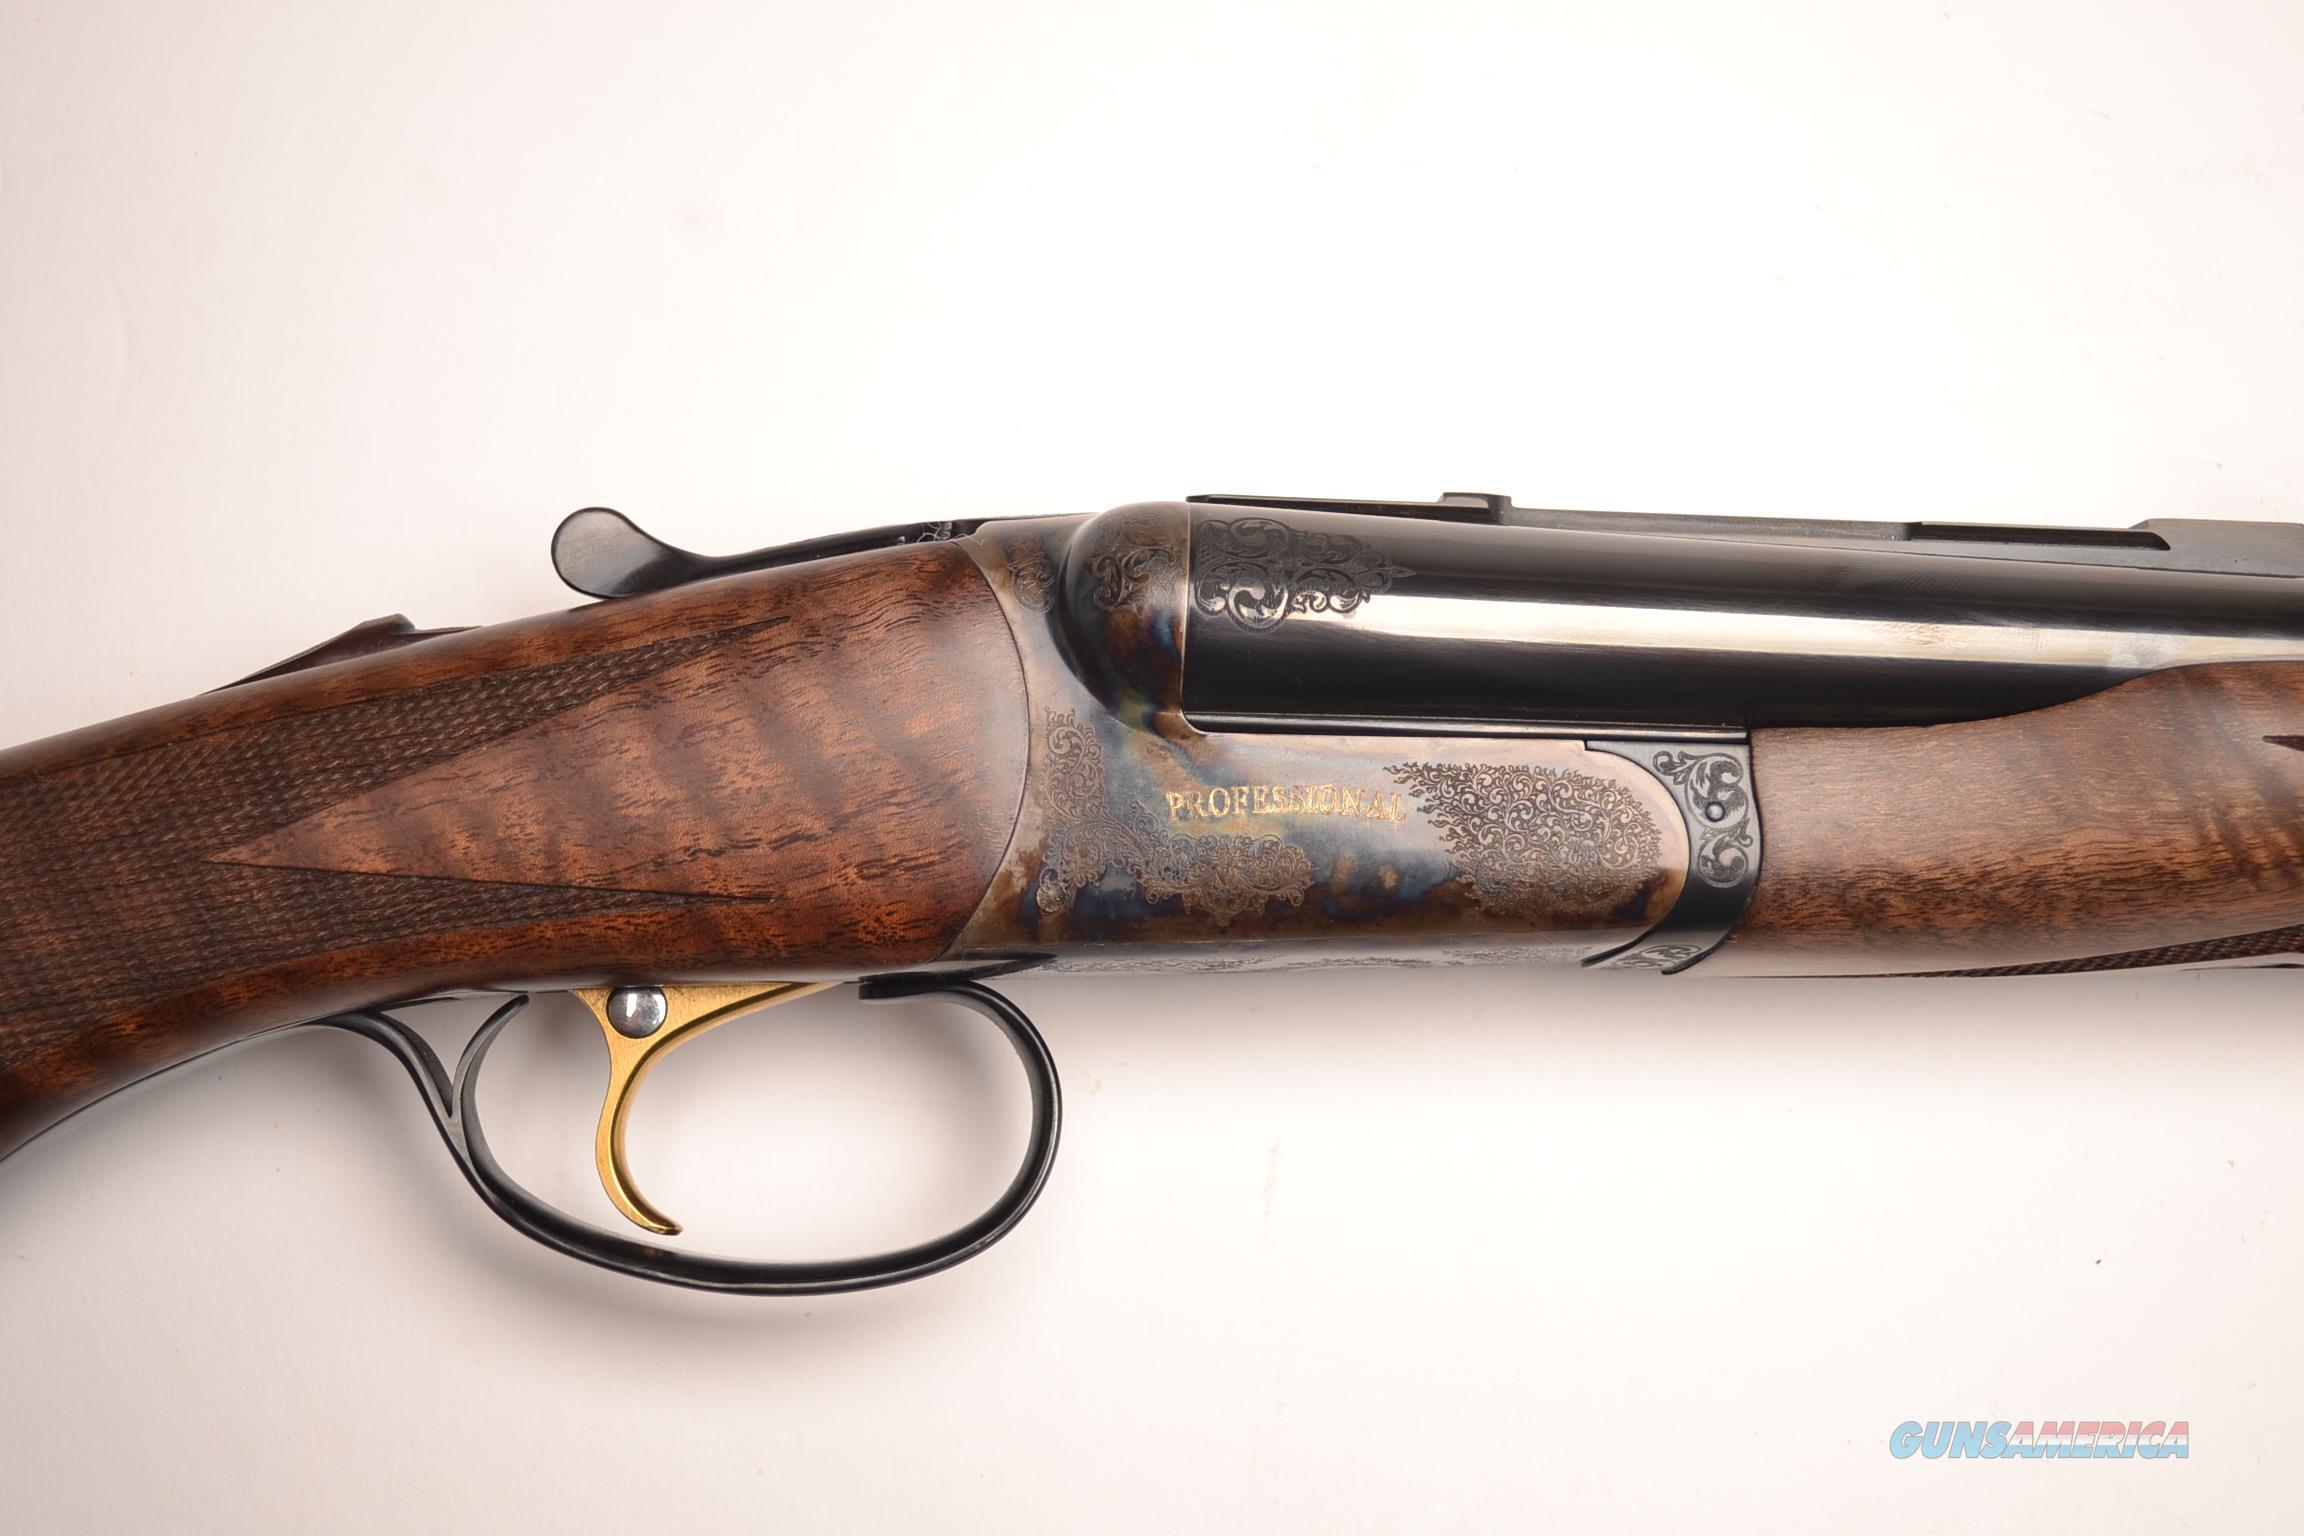 CSMC - RBL Professional  Guns > Shotguns > Connecticut (Galazan) Shotguns